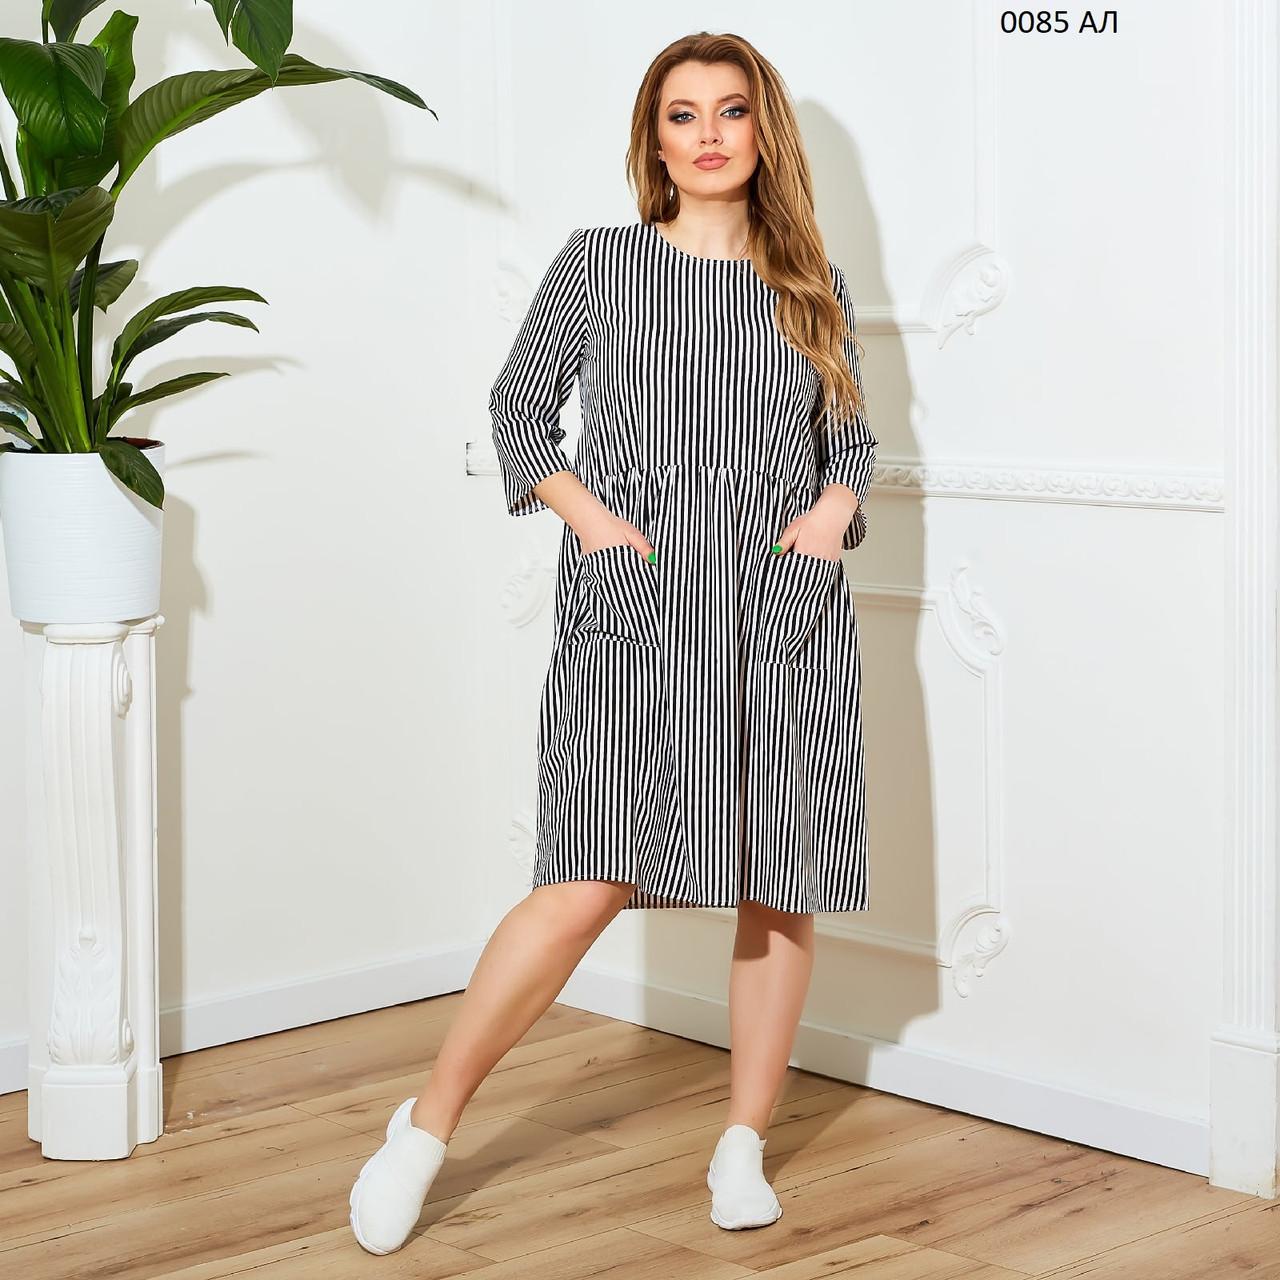 Жіноче плаття норма+ батал 0085 АЛ